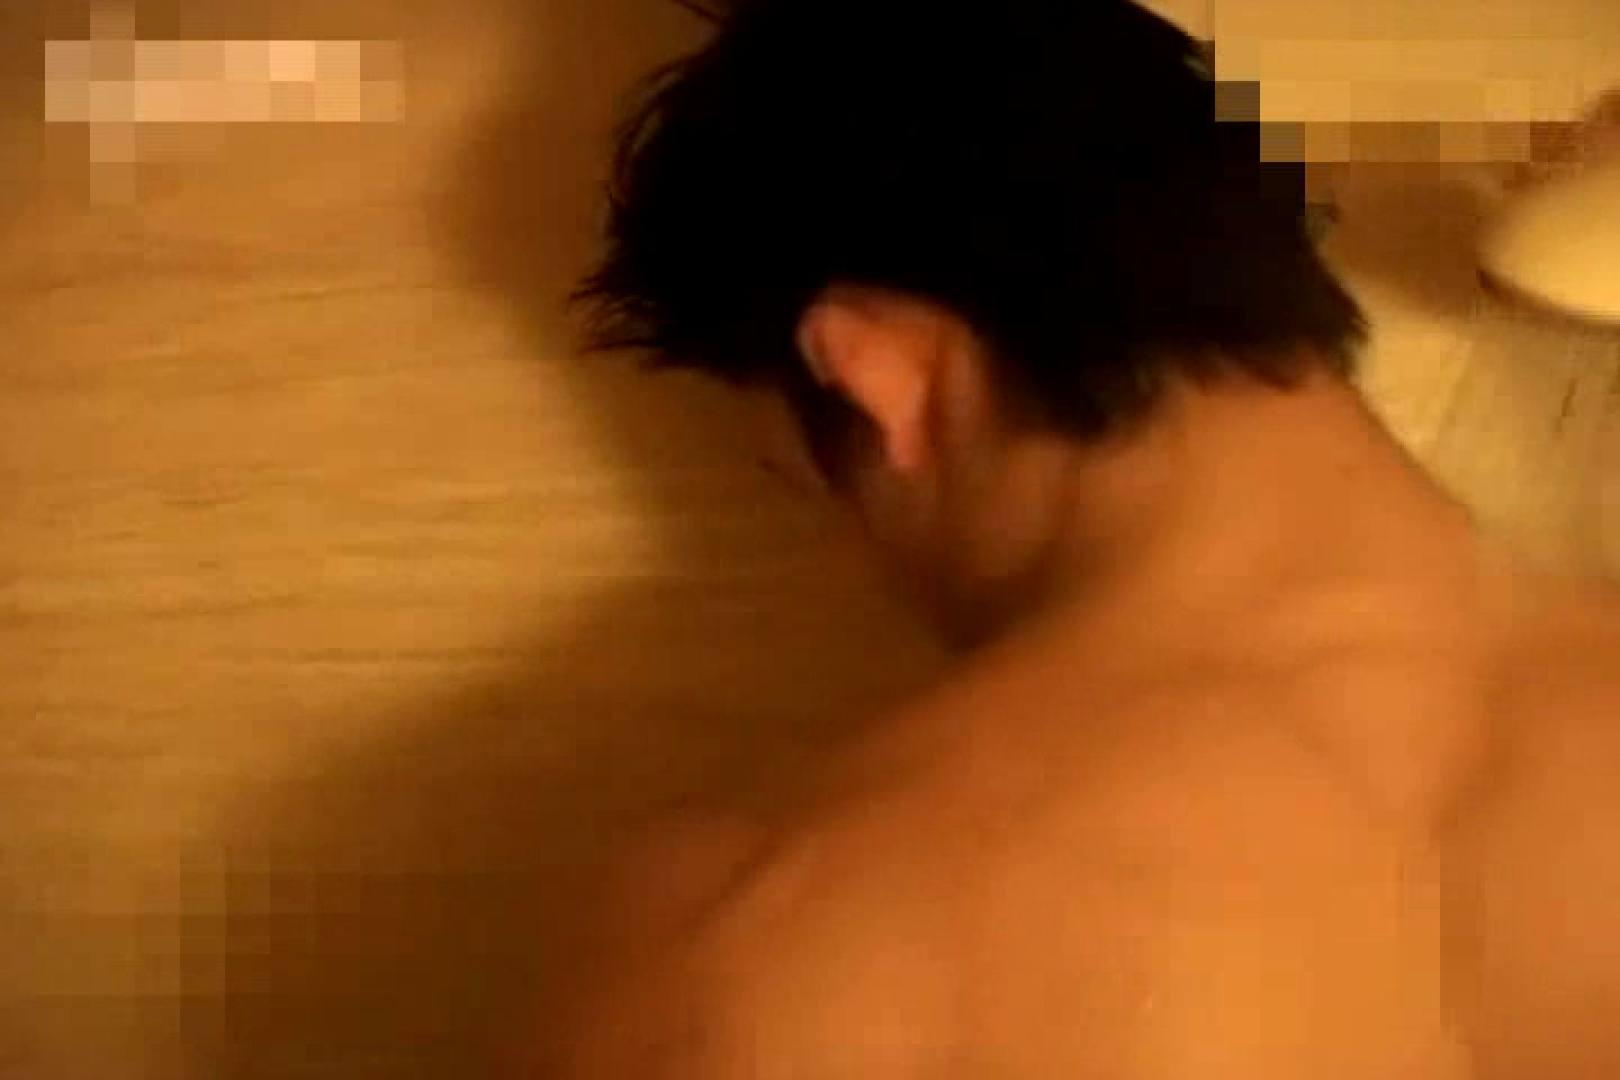 Beautiful muscle モッコリ野郎達!Vol.03 スジ筋系男子 男同士動画 79枚 8